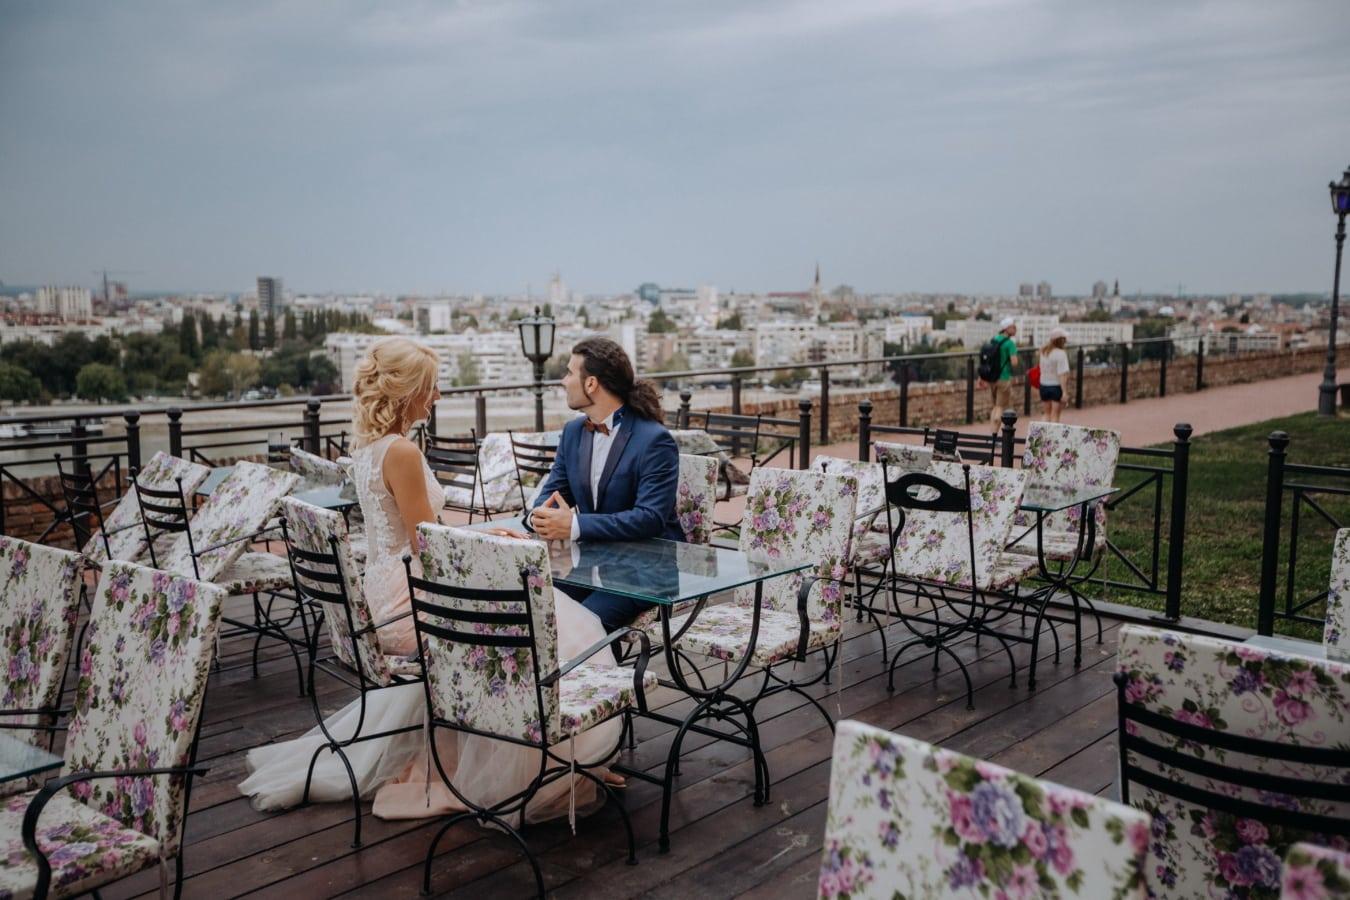 lunch, romantic, panorama, boyfriend, girlfriend, urban area, downtown, resort area, patio, area